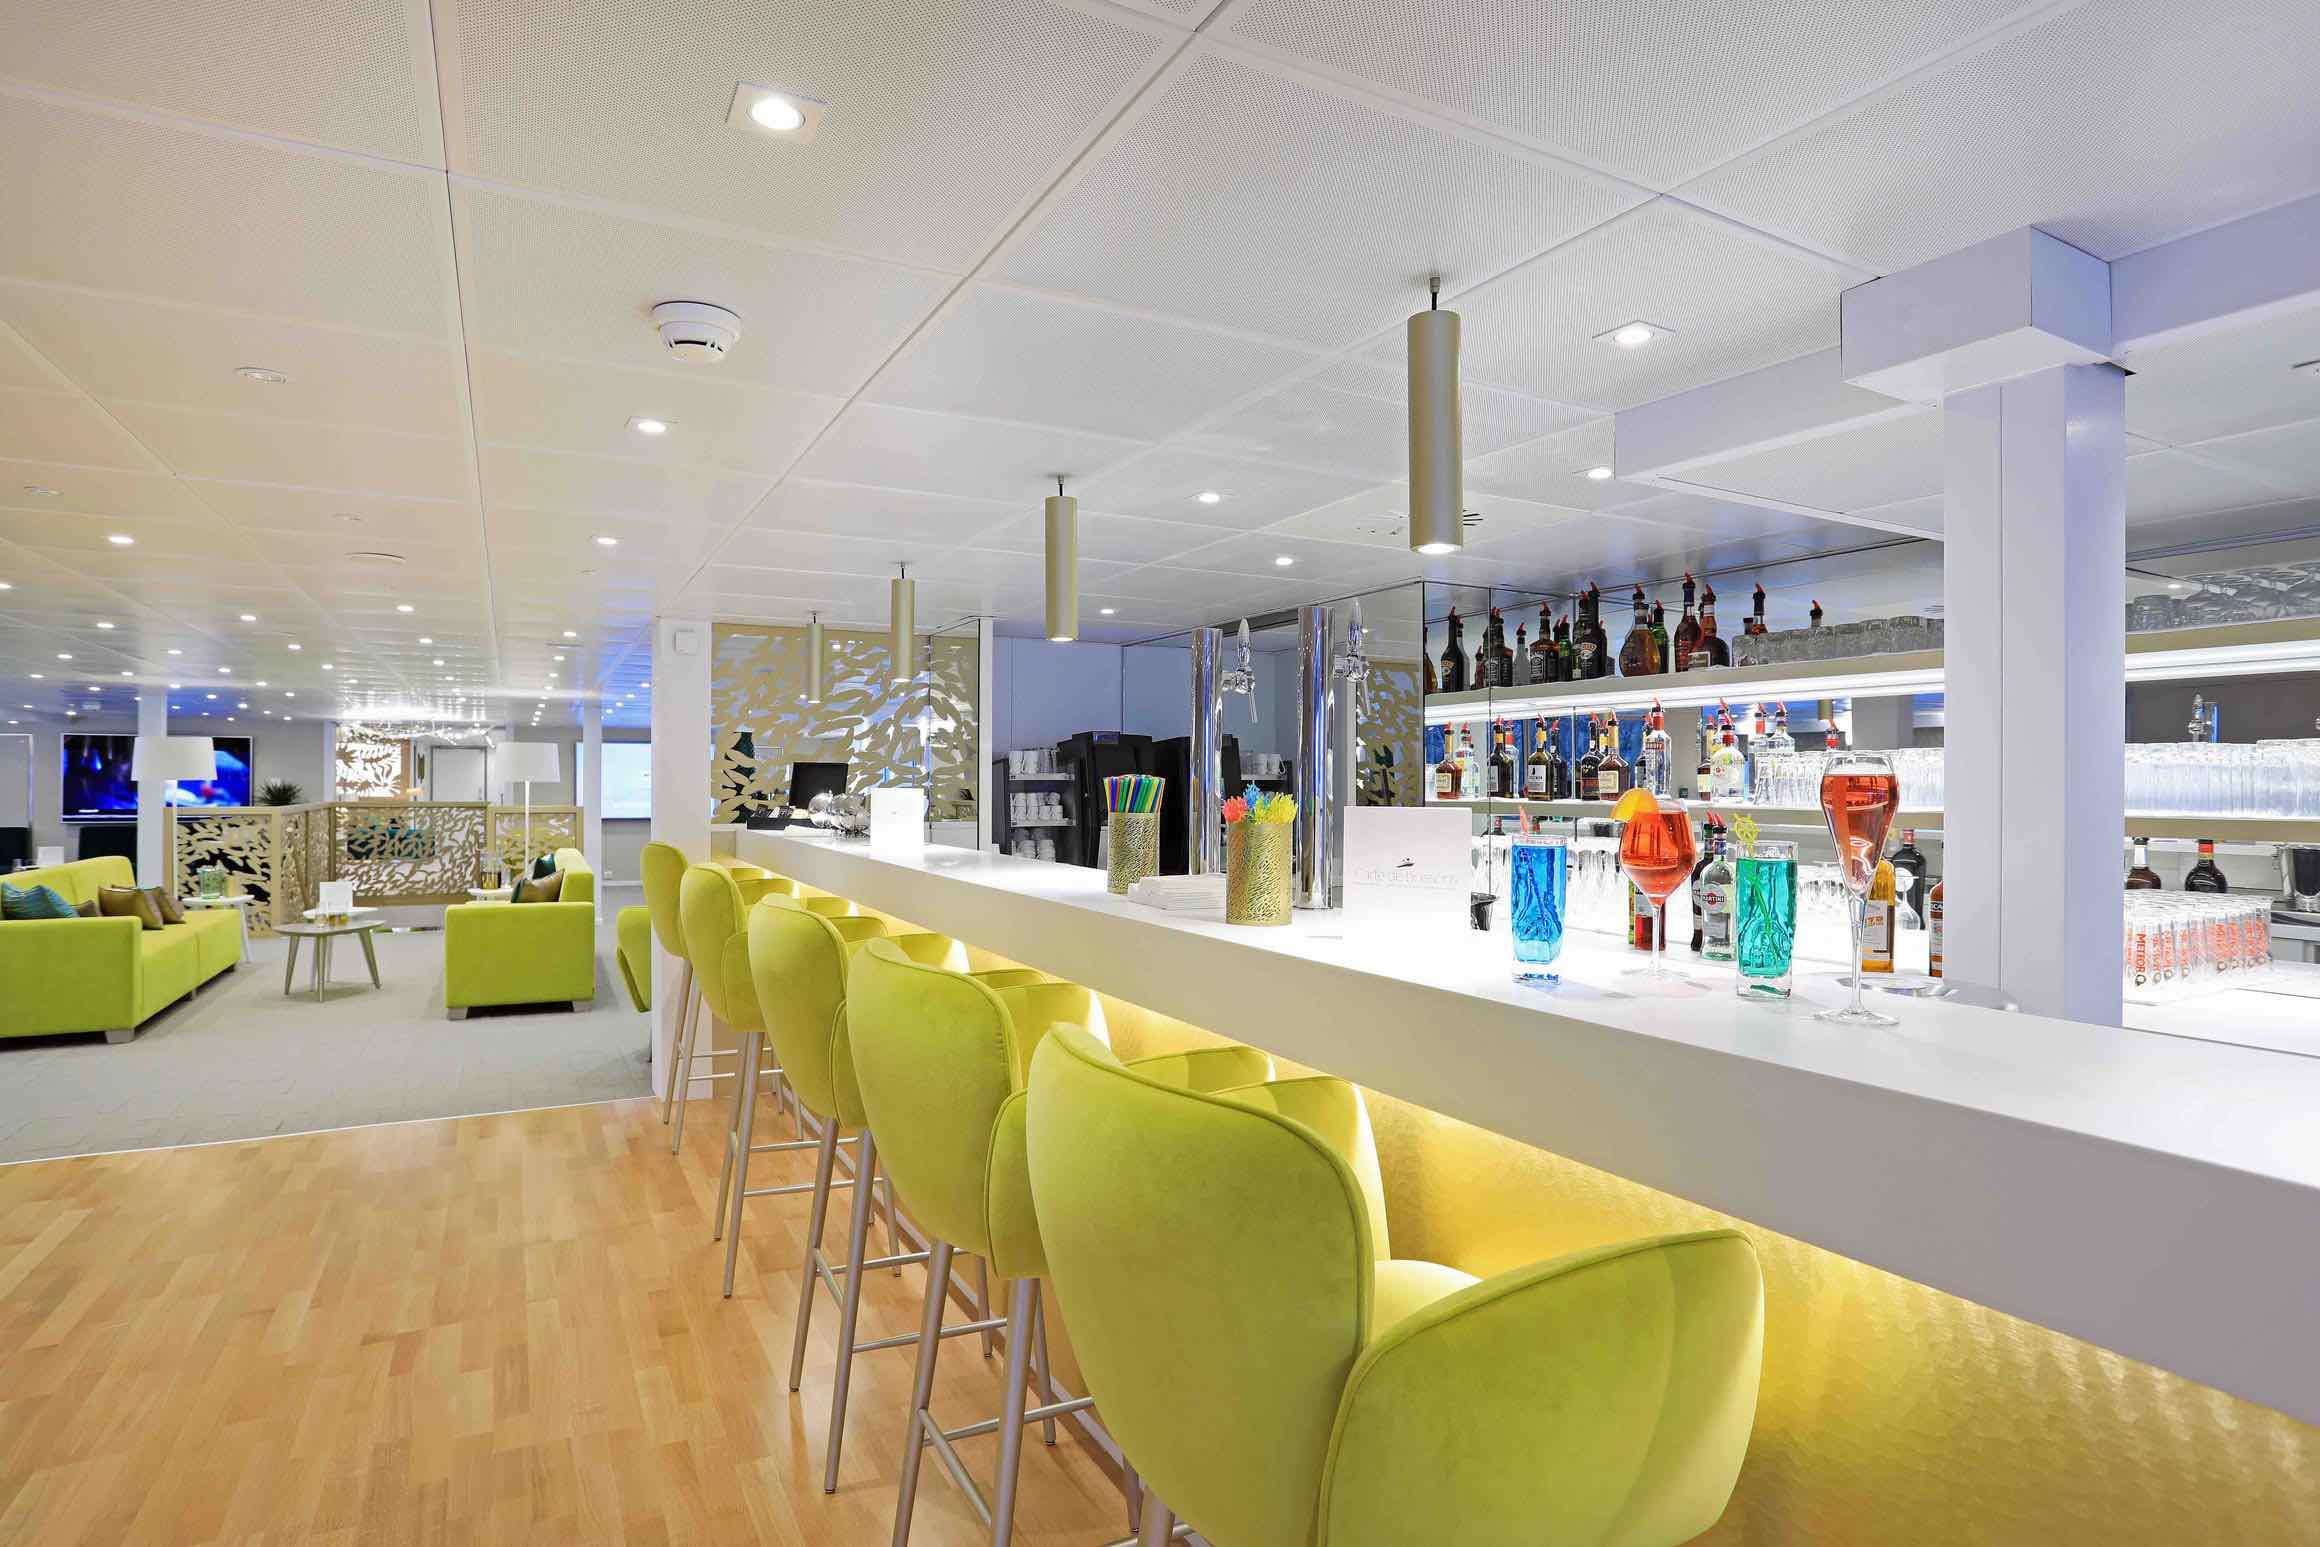 MS Elbe Princesse II Salon mit Bar